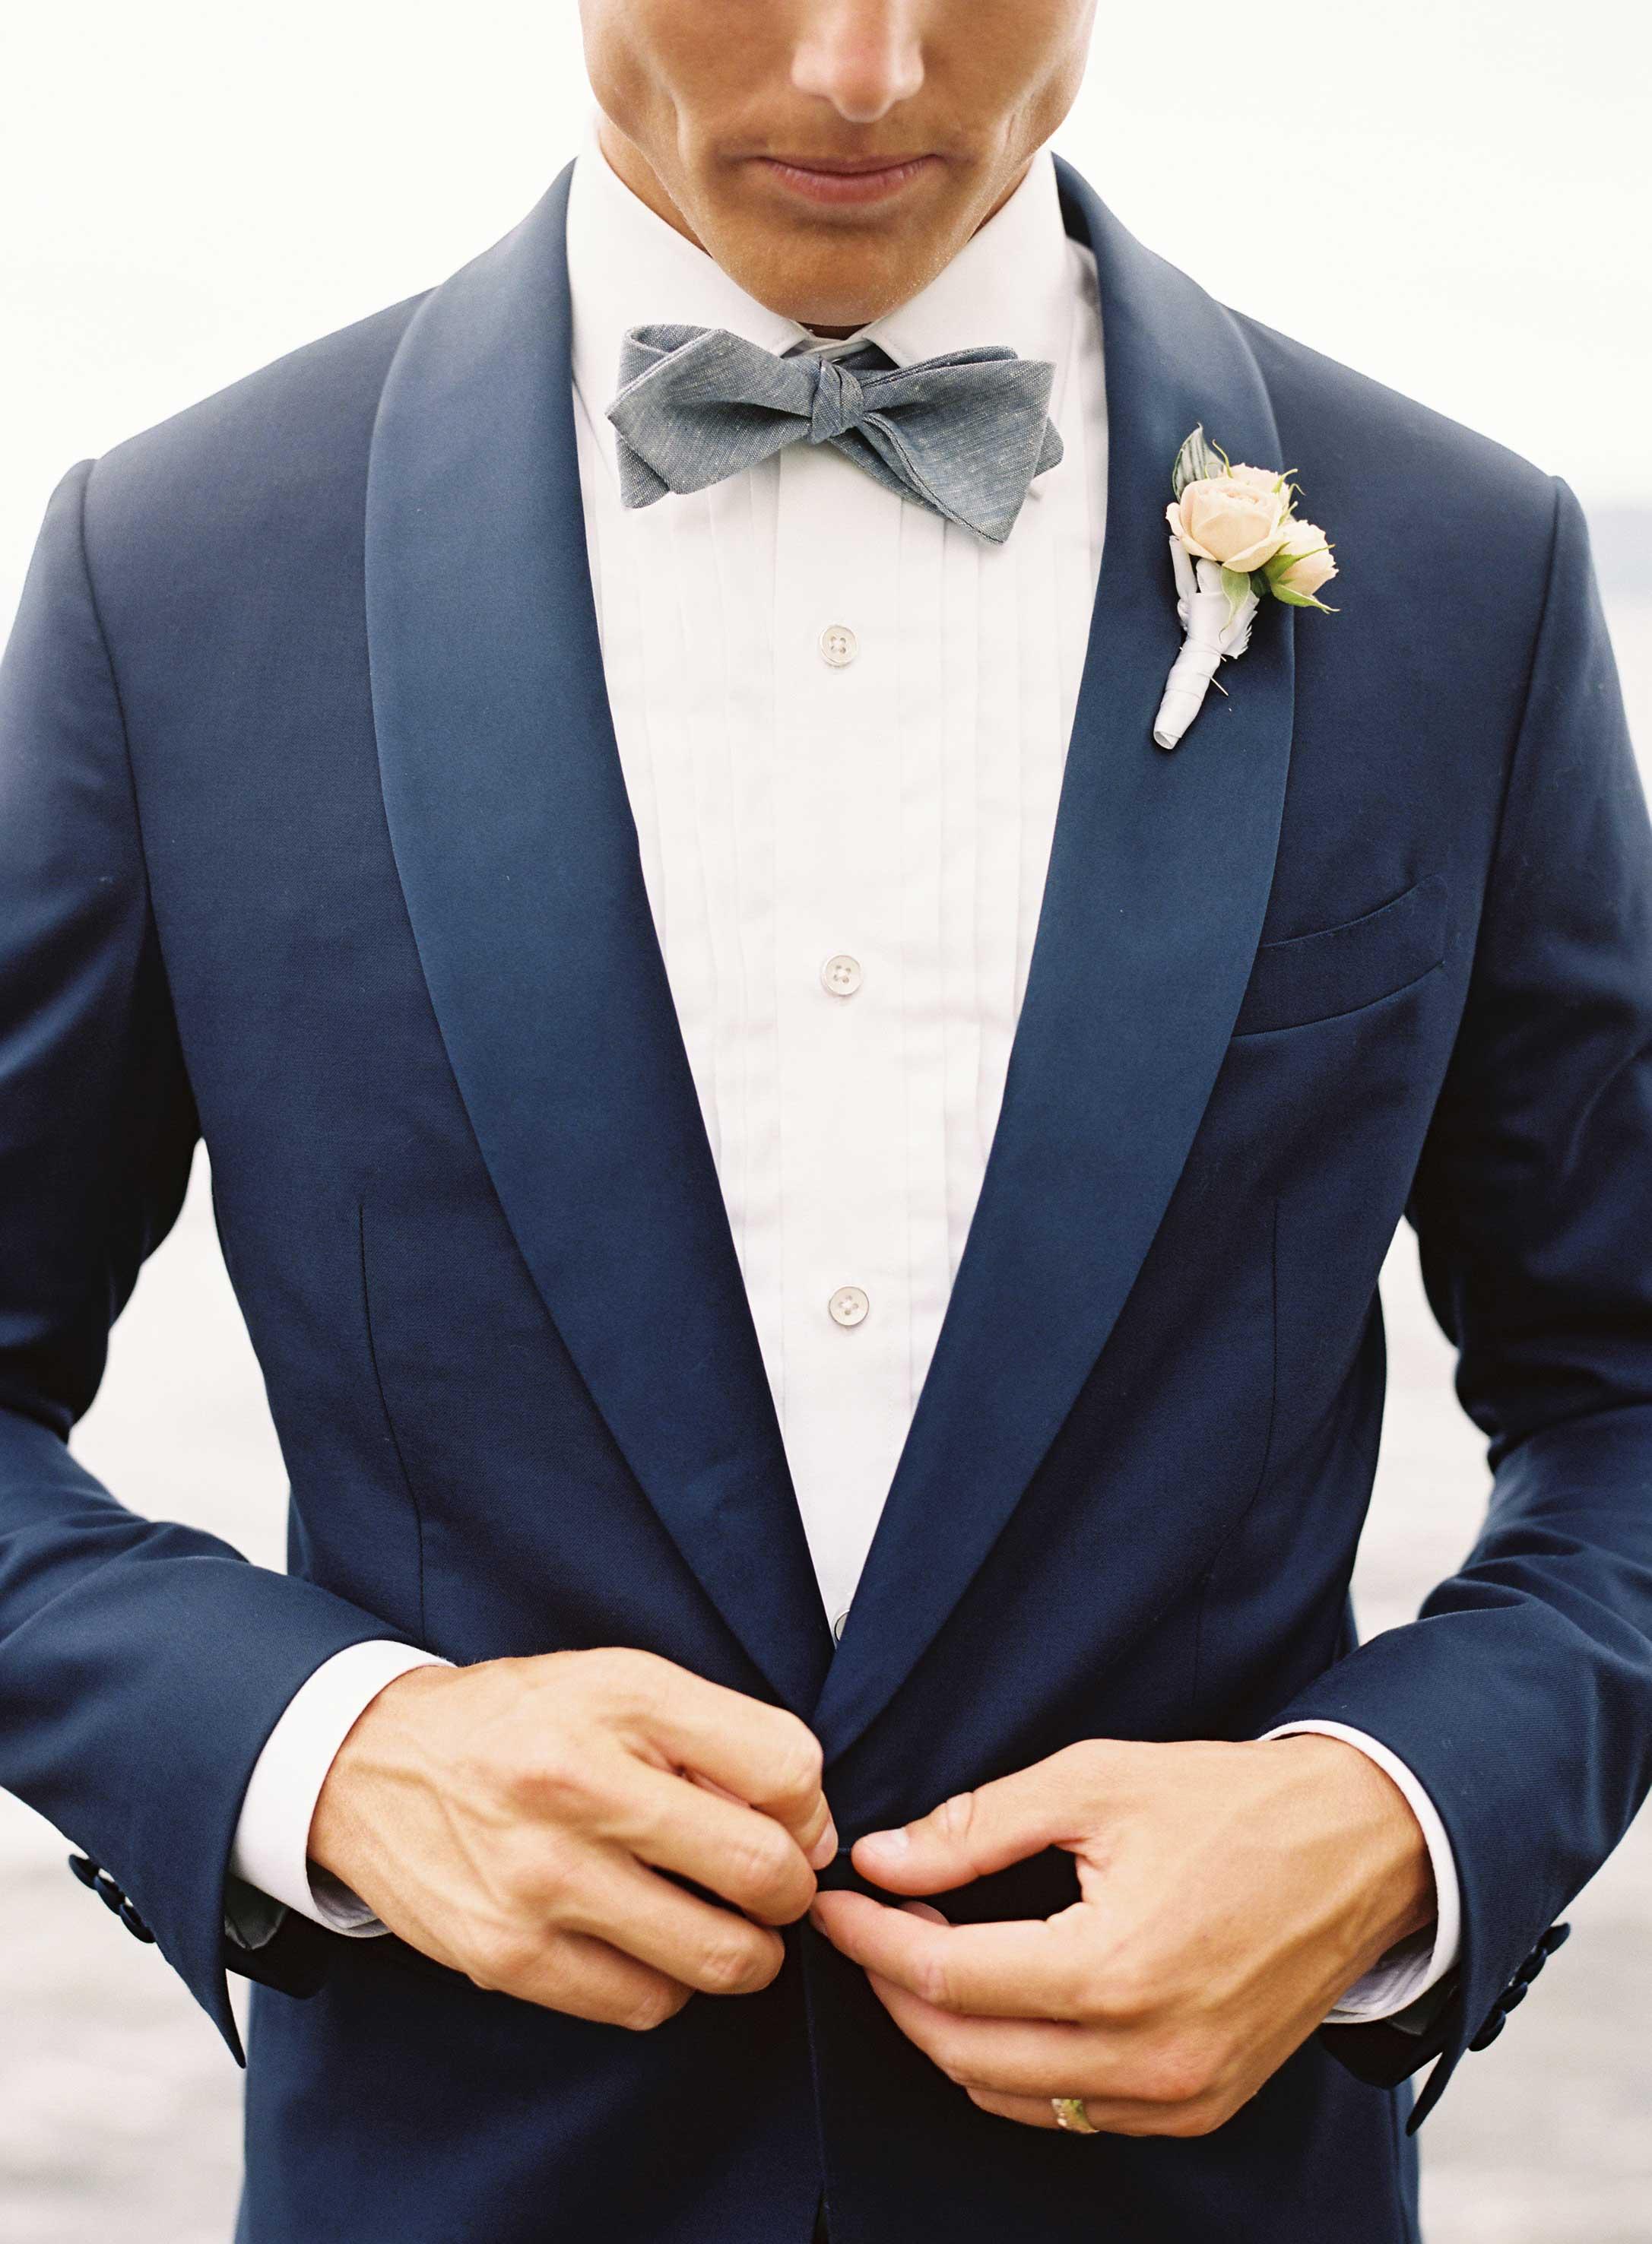 Groom inspiration bryce harper 39 s navy suit inside weddings for Bryce harper mvp shirt